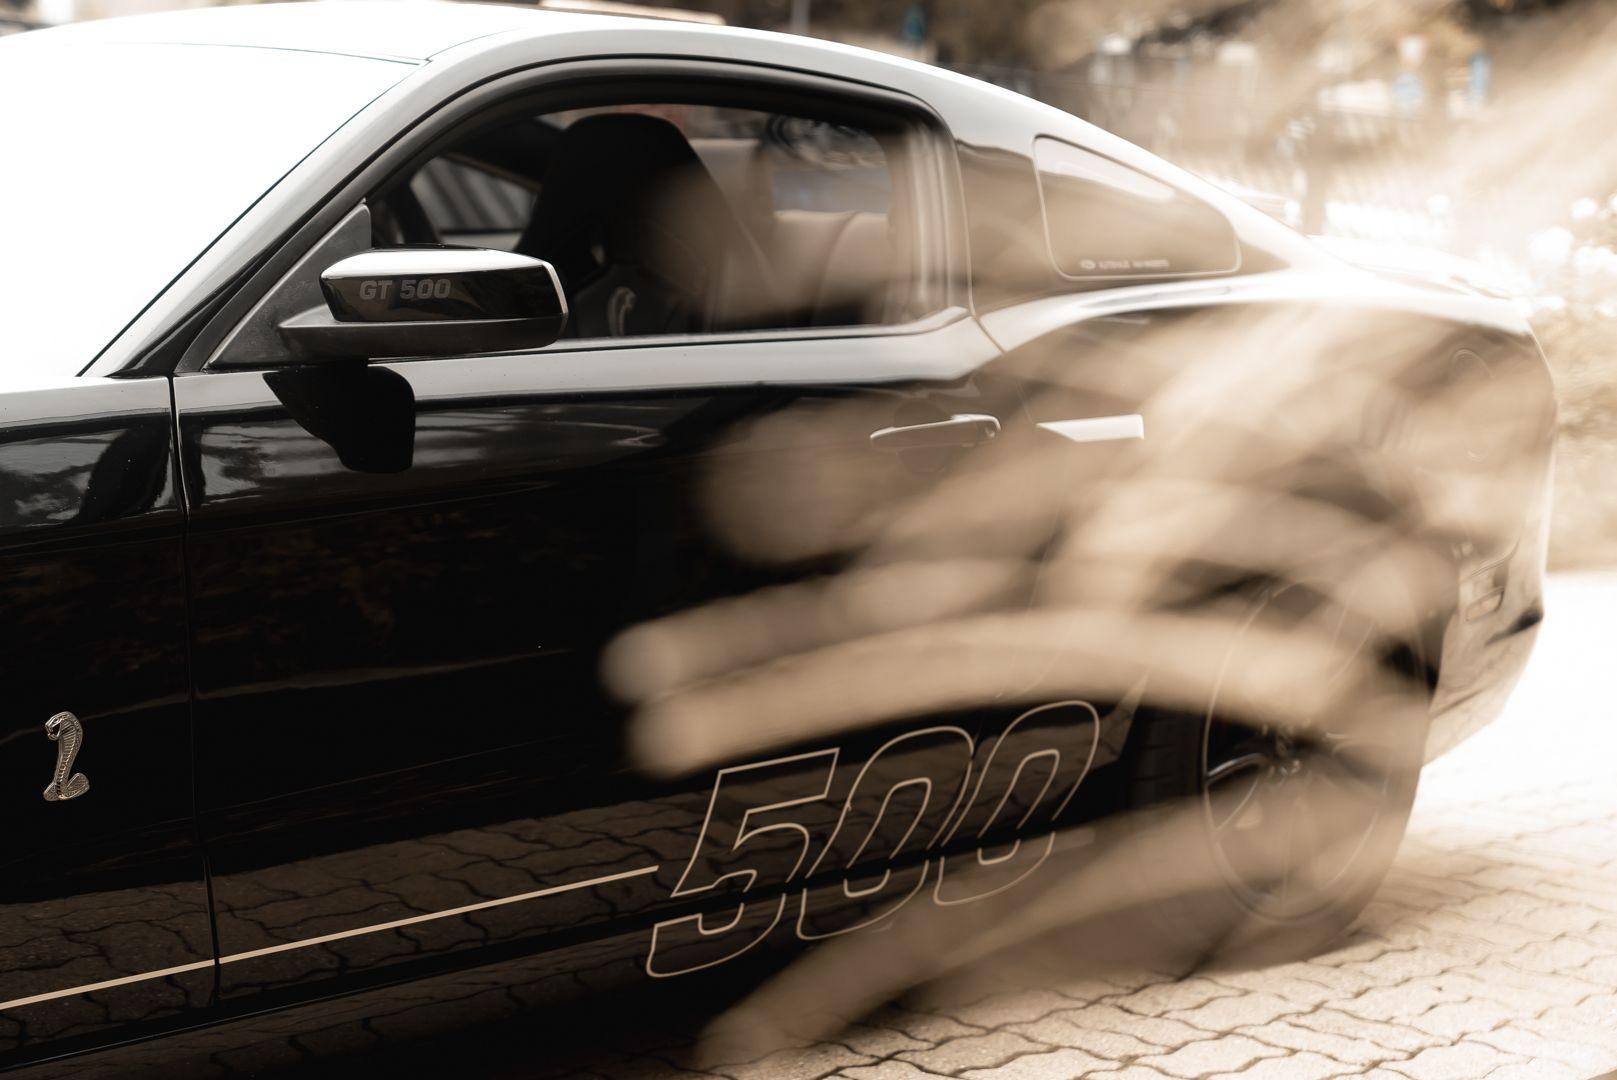 2012 Ford Mustang 5.0 V8 82074